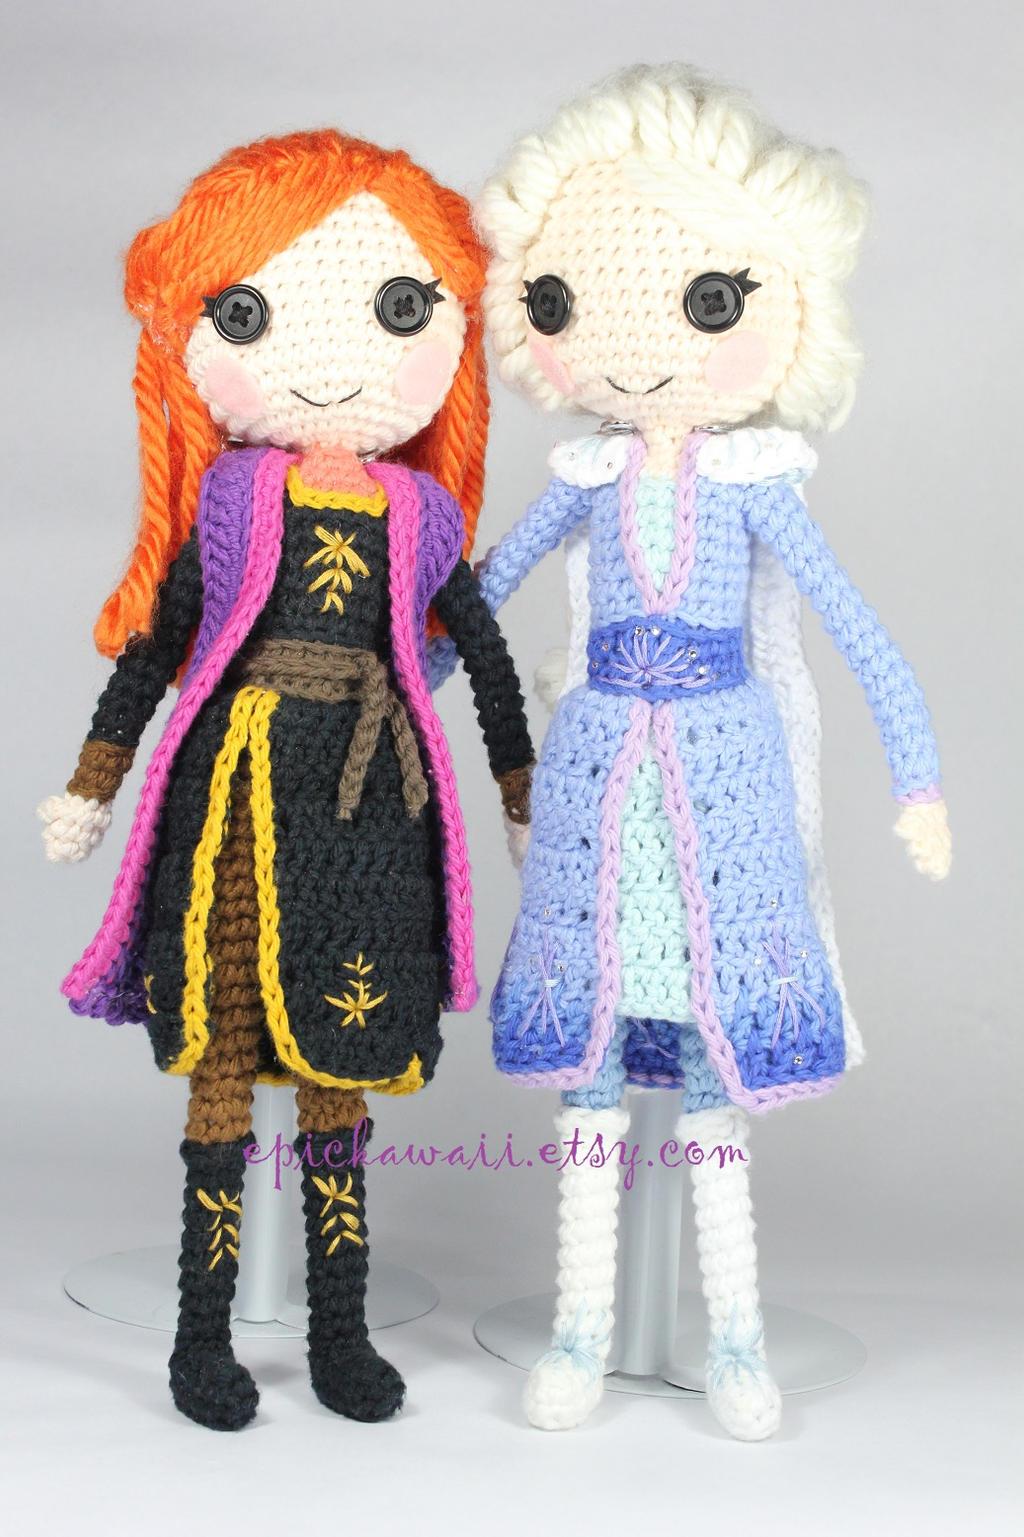 DIY-How to crochet a amigurumi doll head - YouTube | 1537x1024